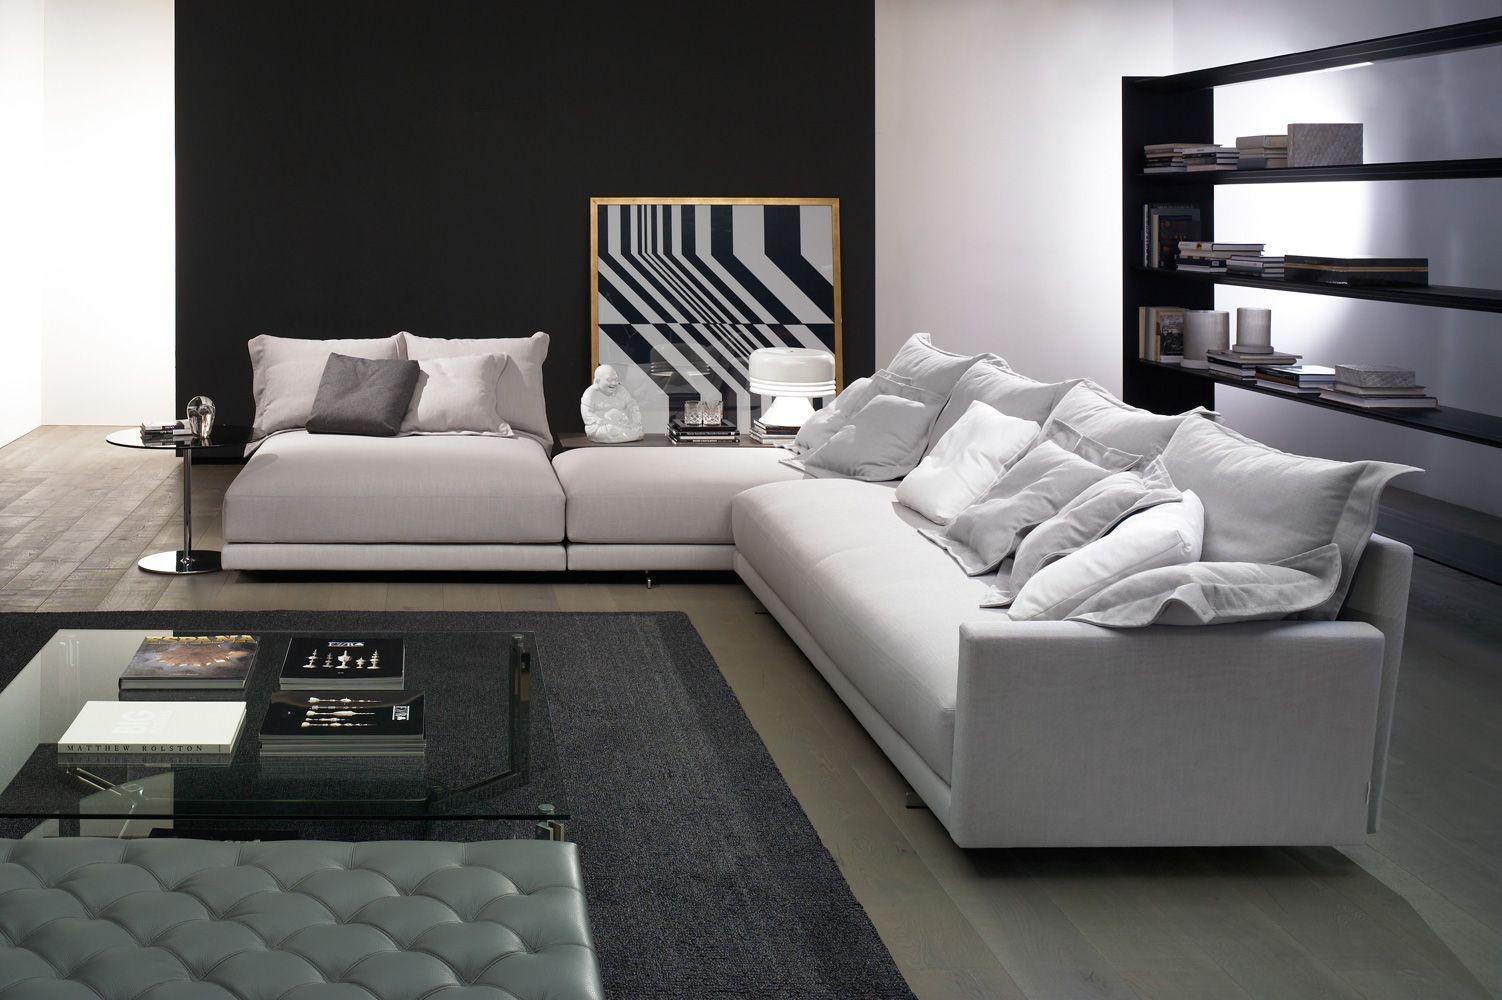 DAVIS FLAT   Frigerio Salotti   NIDO Sofas And Sectionals   Pinterest    Modular Sofa, Living Rooms And Room